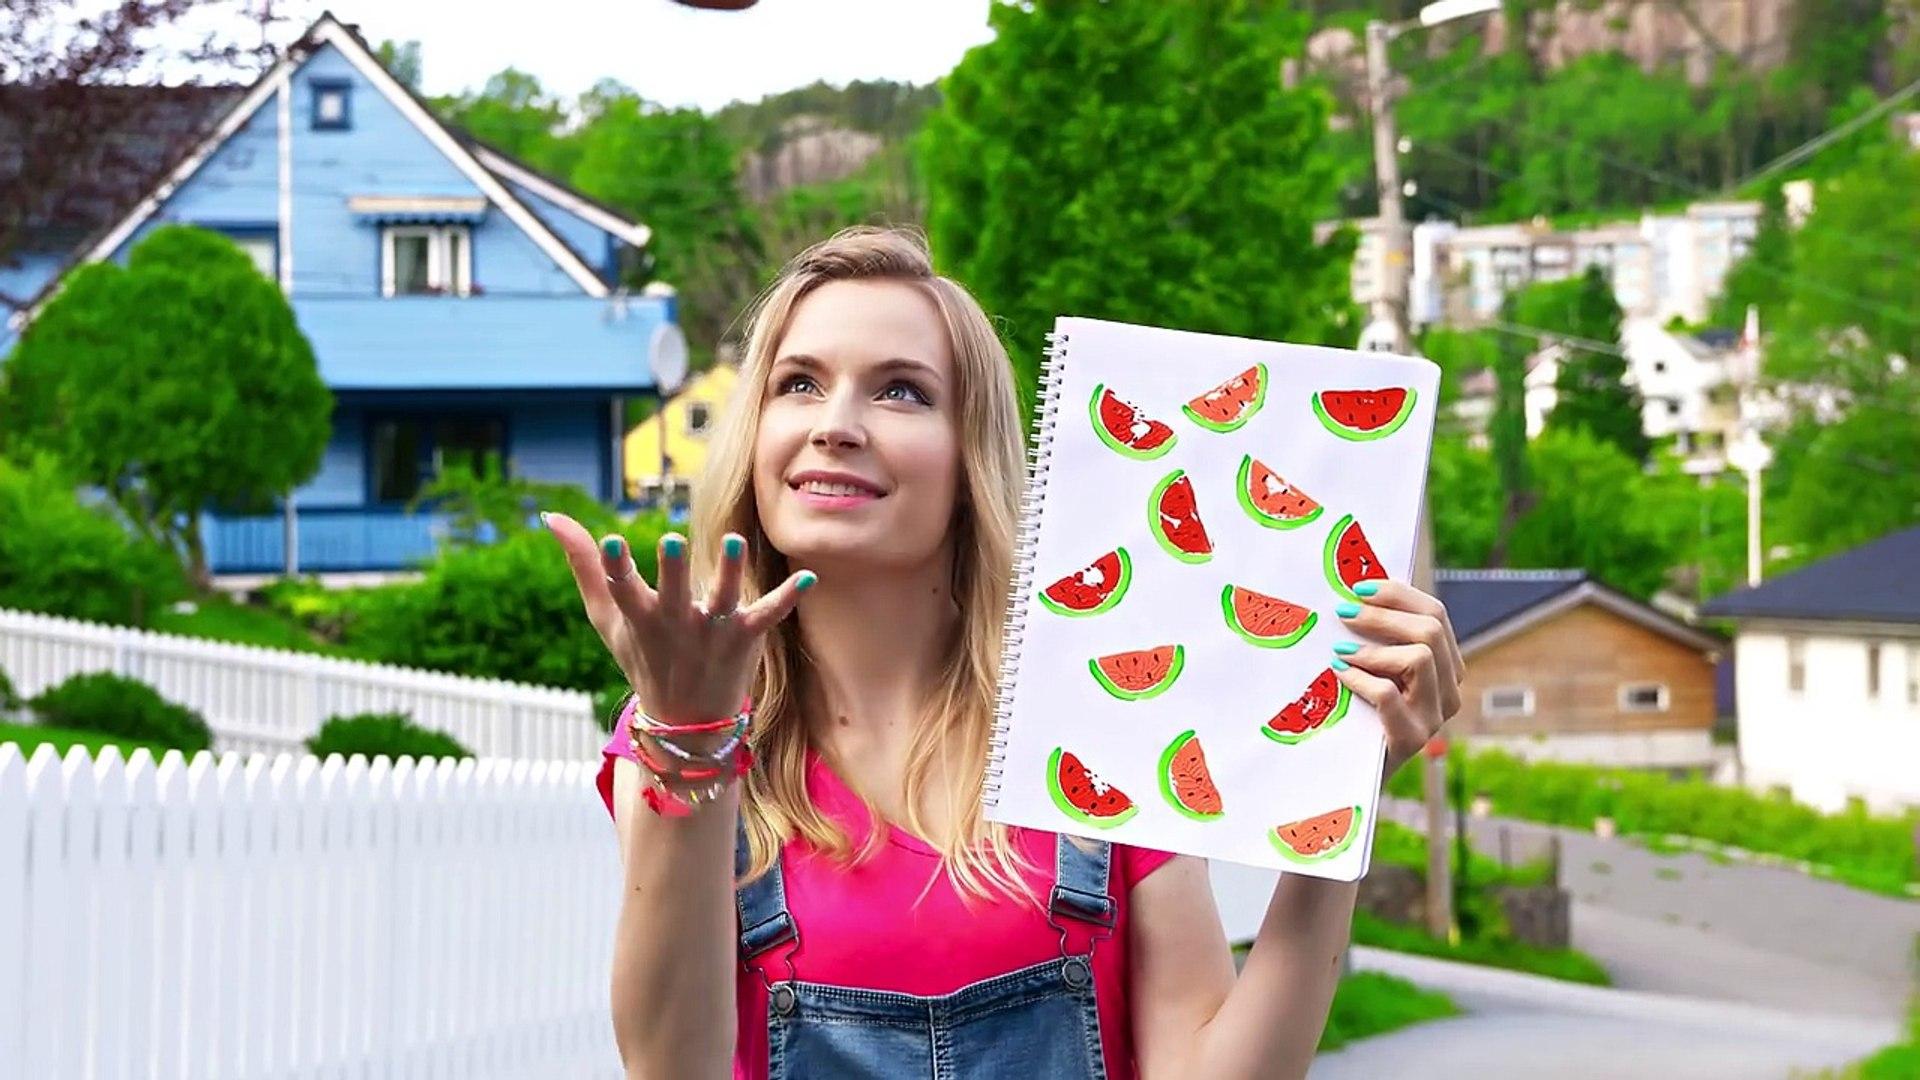 04.DIY School Supplies! 10 Weird DIY Crafts for Back to School with DIY Lover!